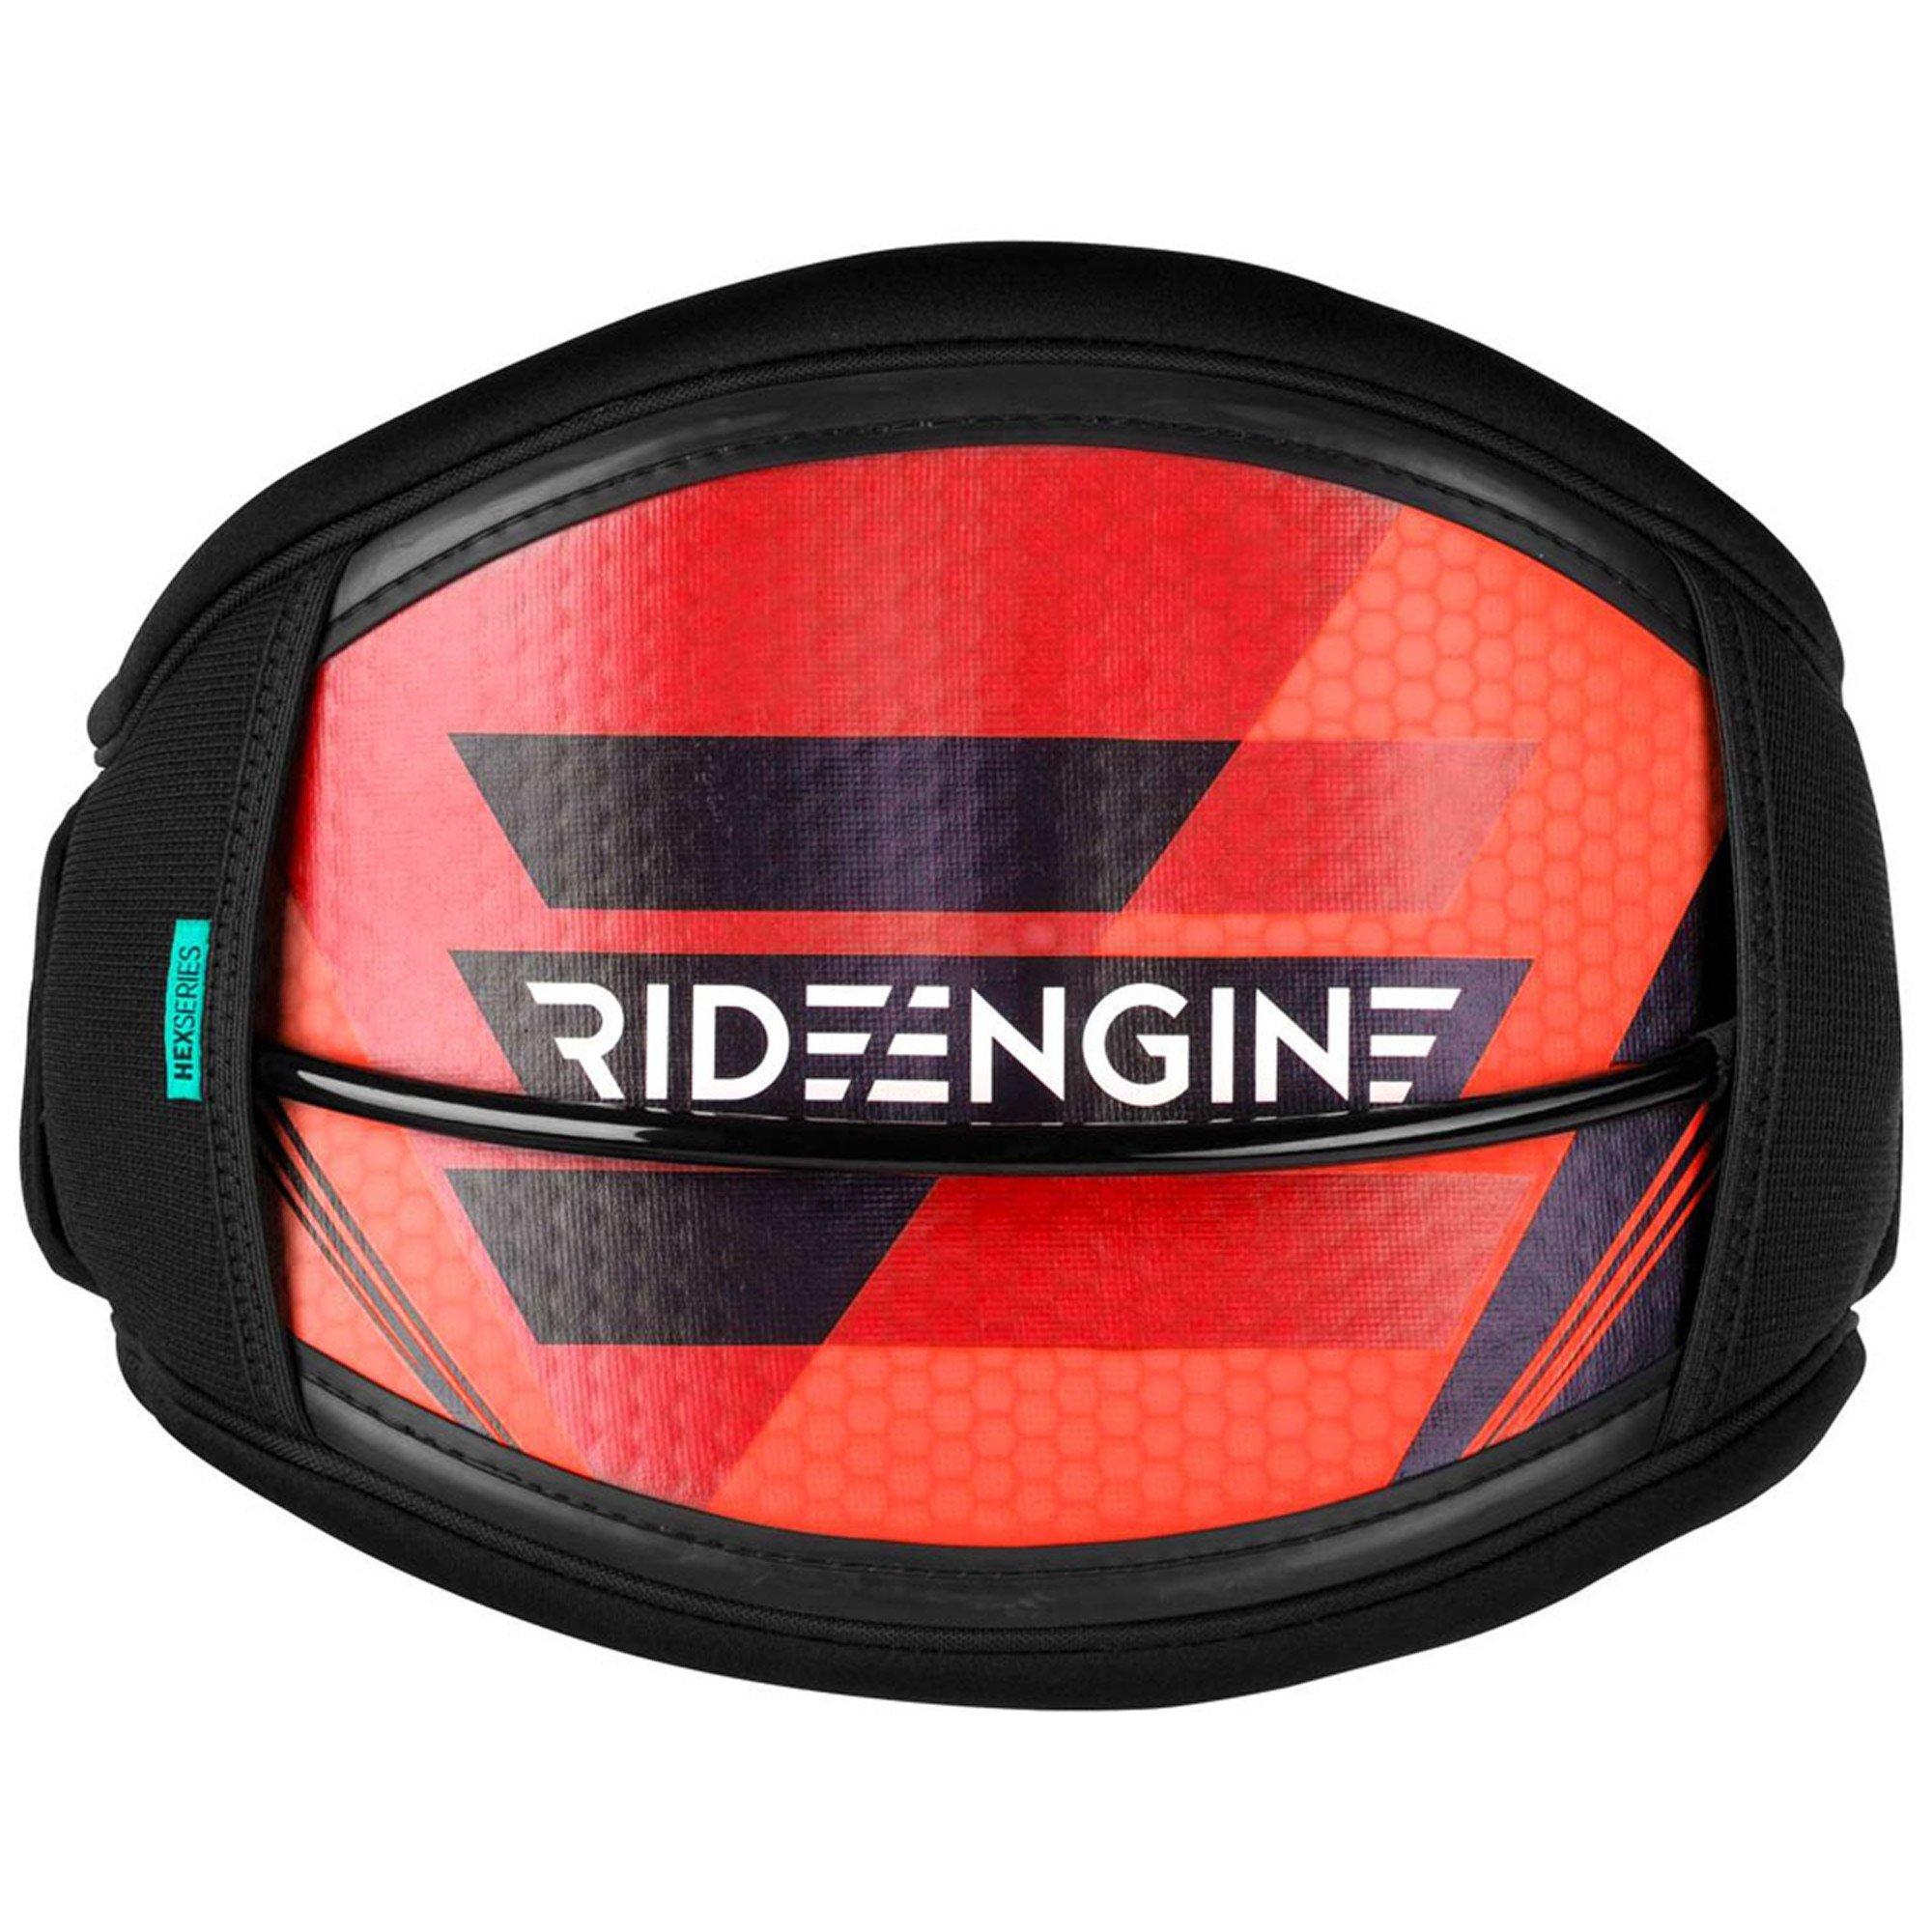 Ride Engine Kiteboarding HarnessHex-Core Orange Harness M by Ride Engine (Image #3)